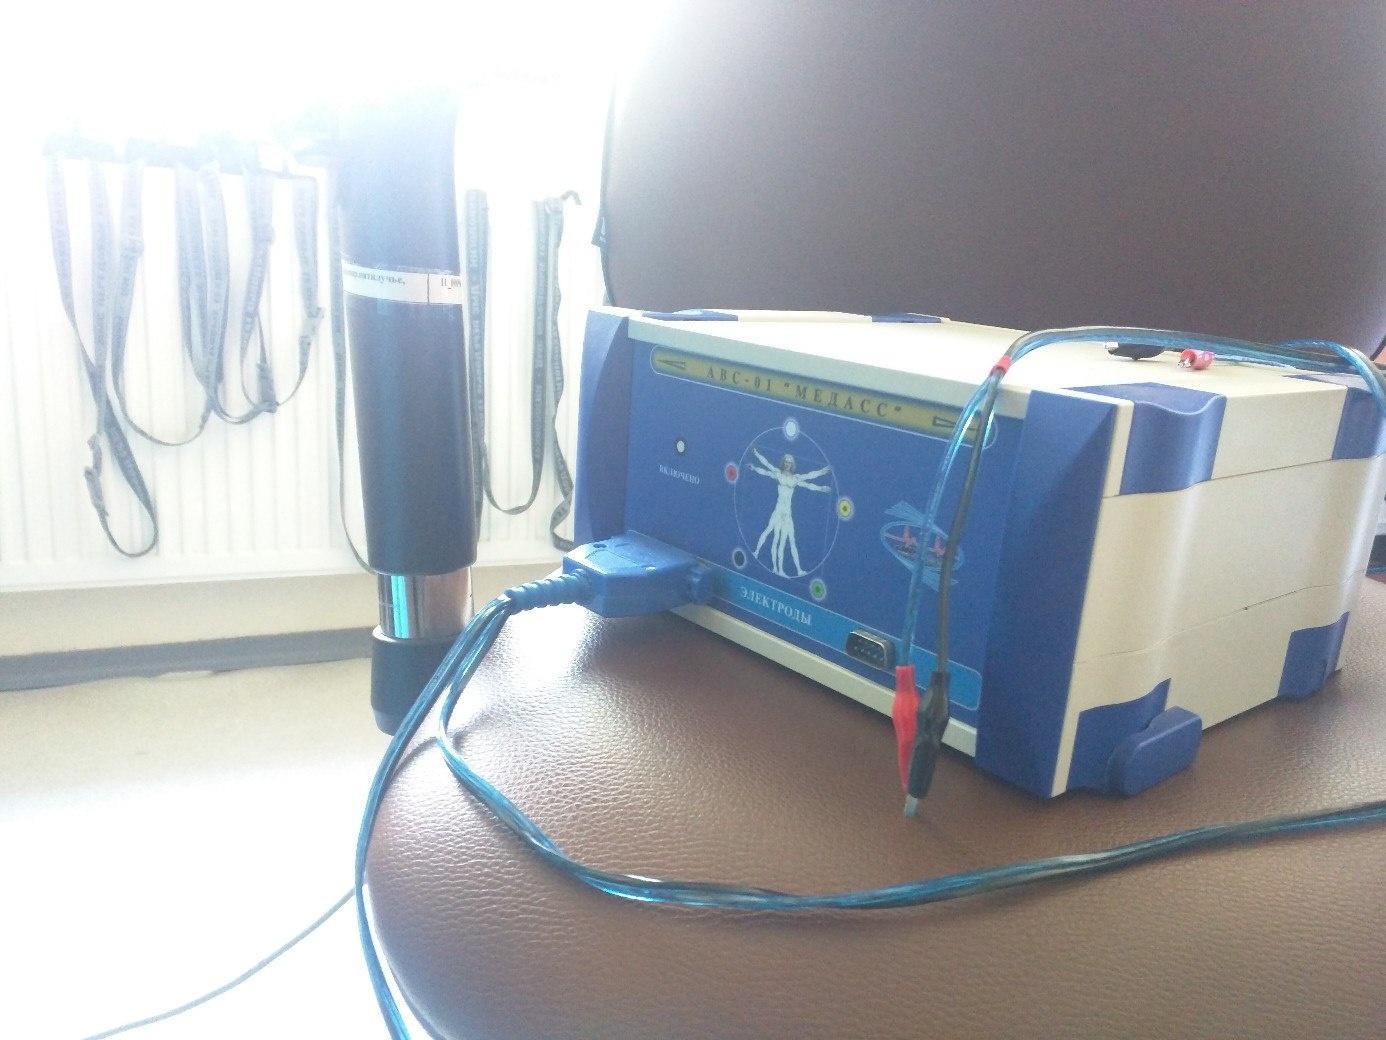 Весы-анализатор MGB Body fat scale — сравнительный «клинический» тест в ЦКБ РЖД - 3